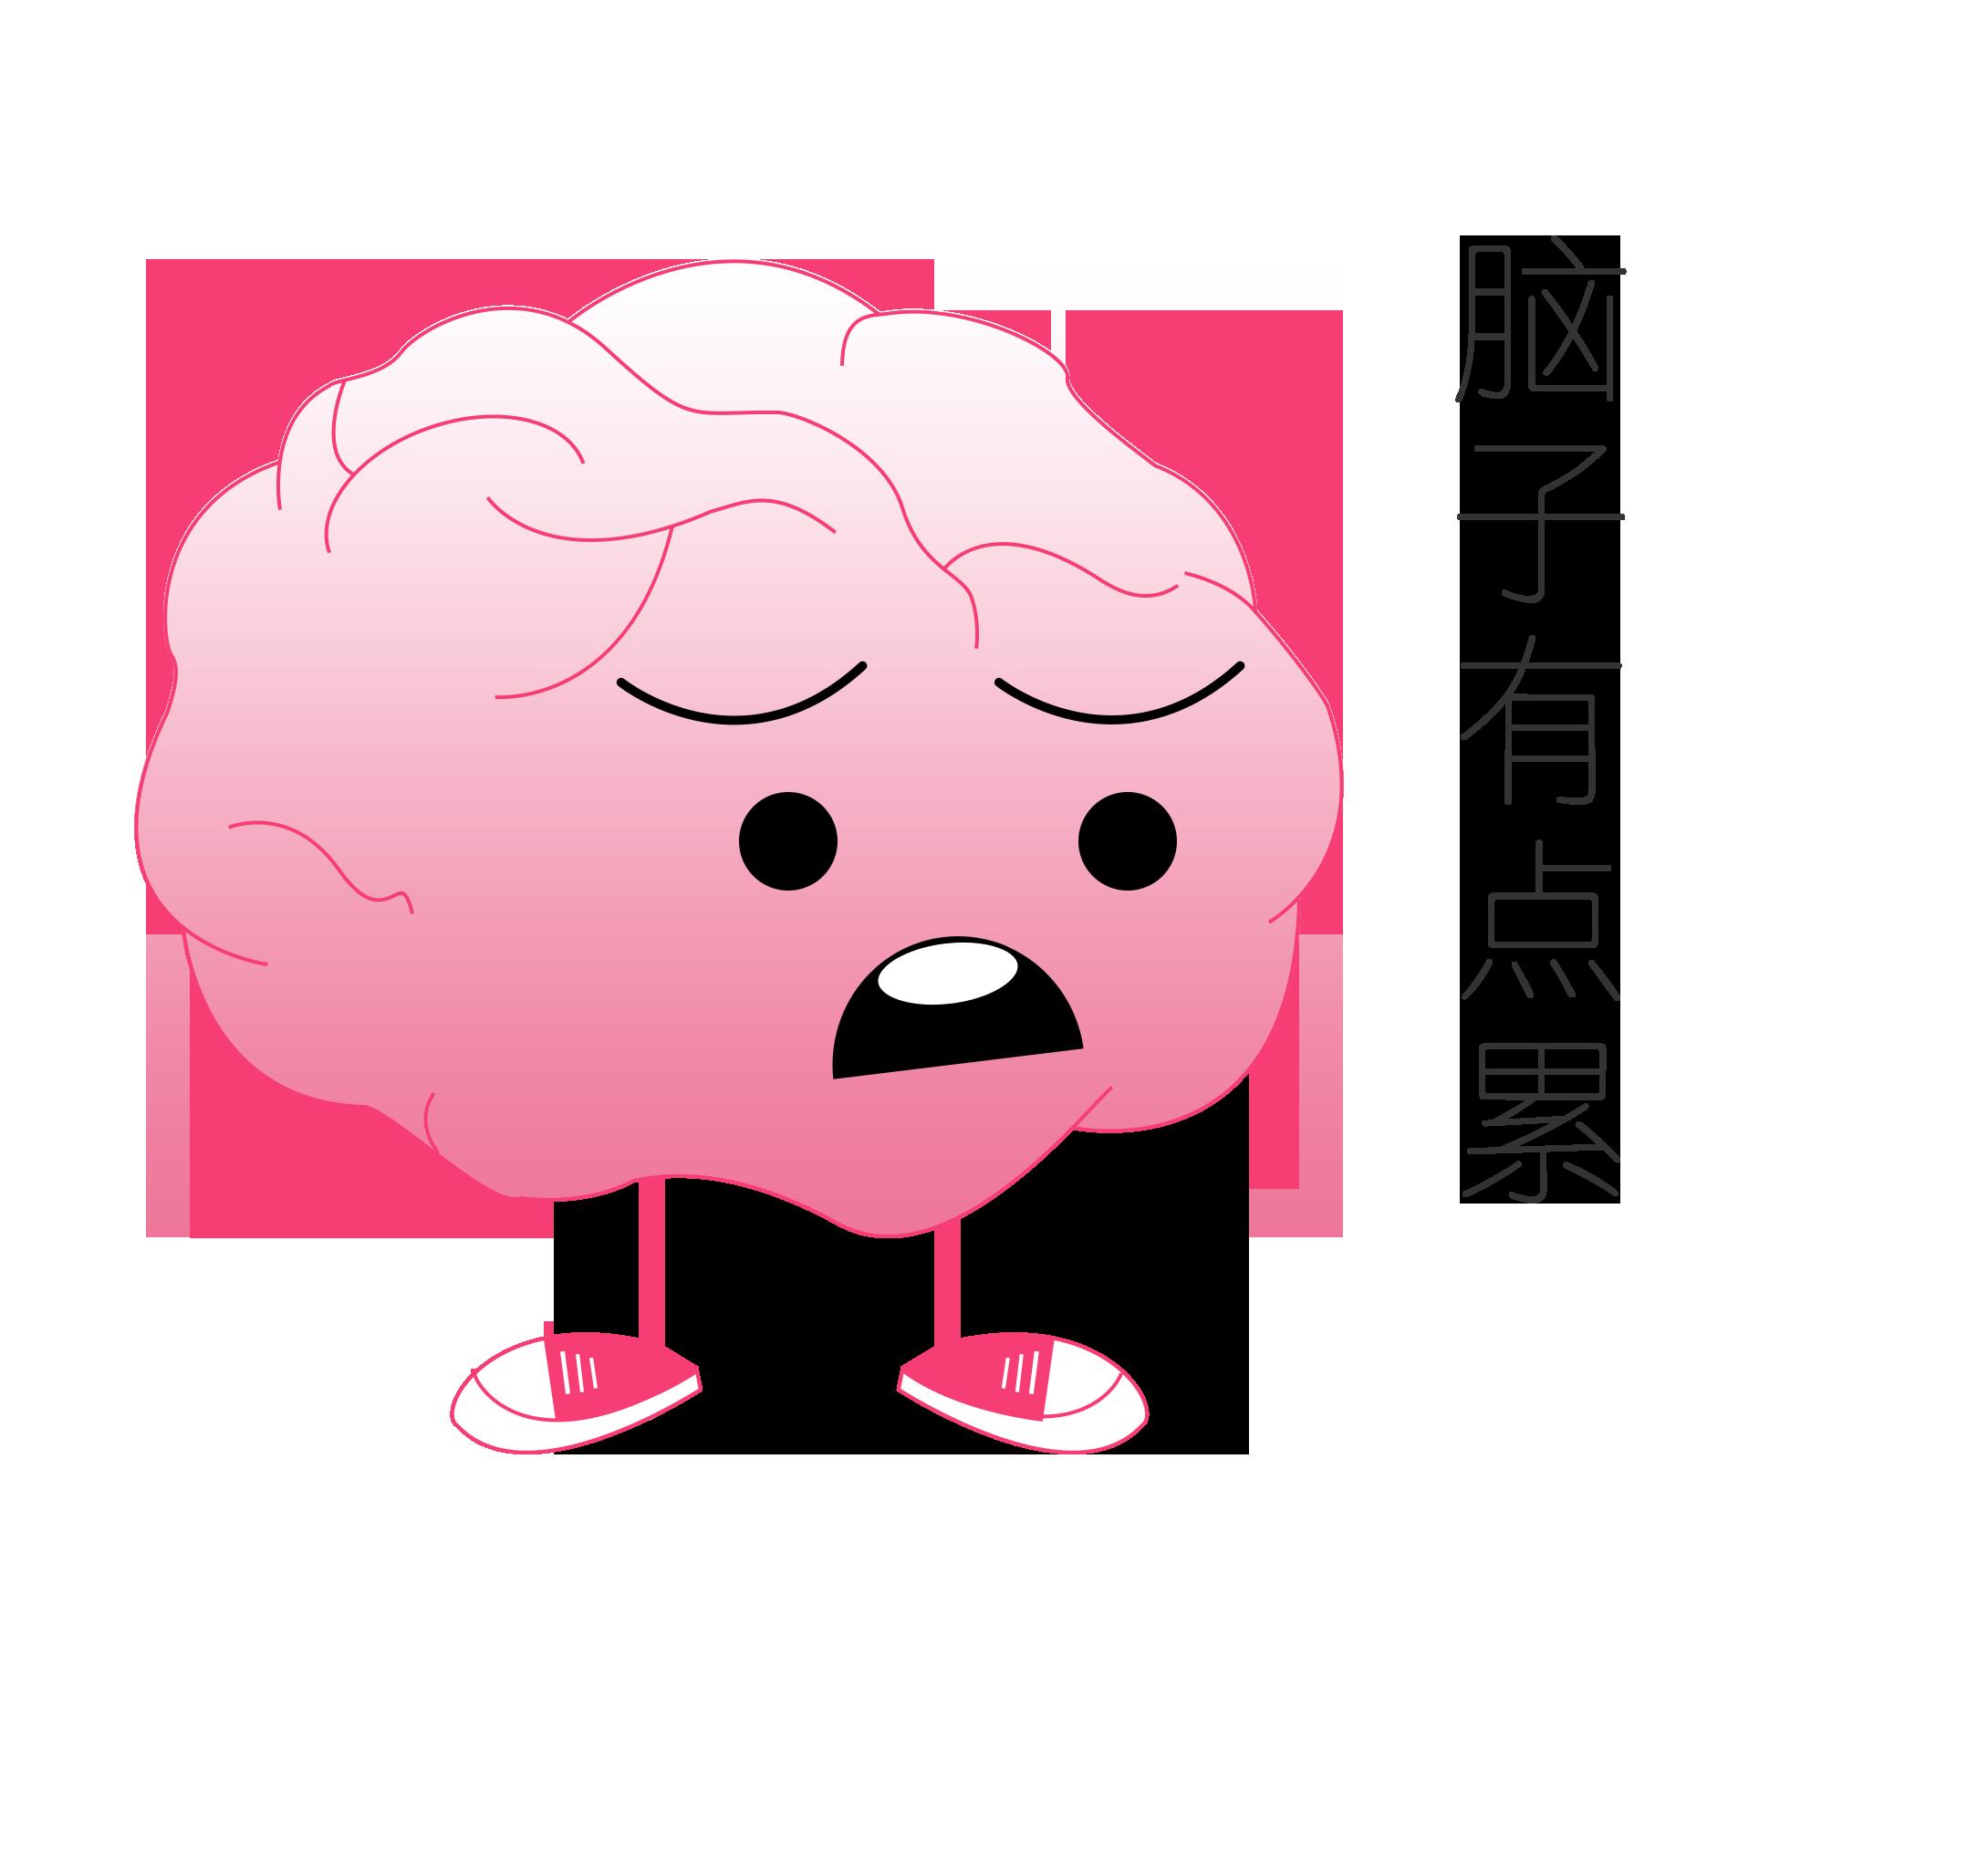 脑洞大师-Emoji样式贼多 messages sticker-7